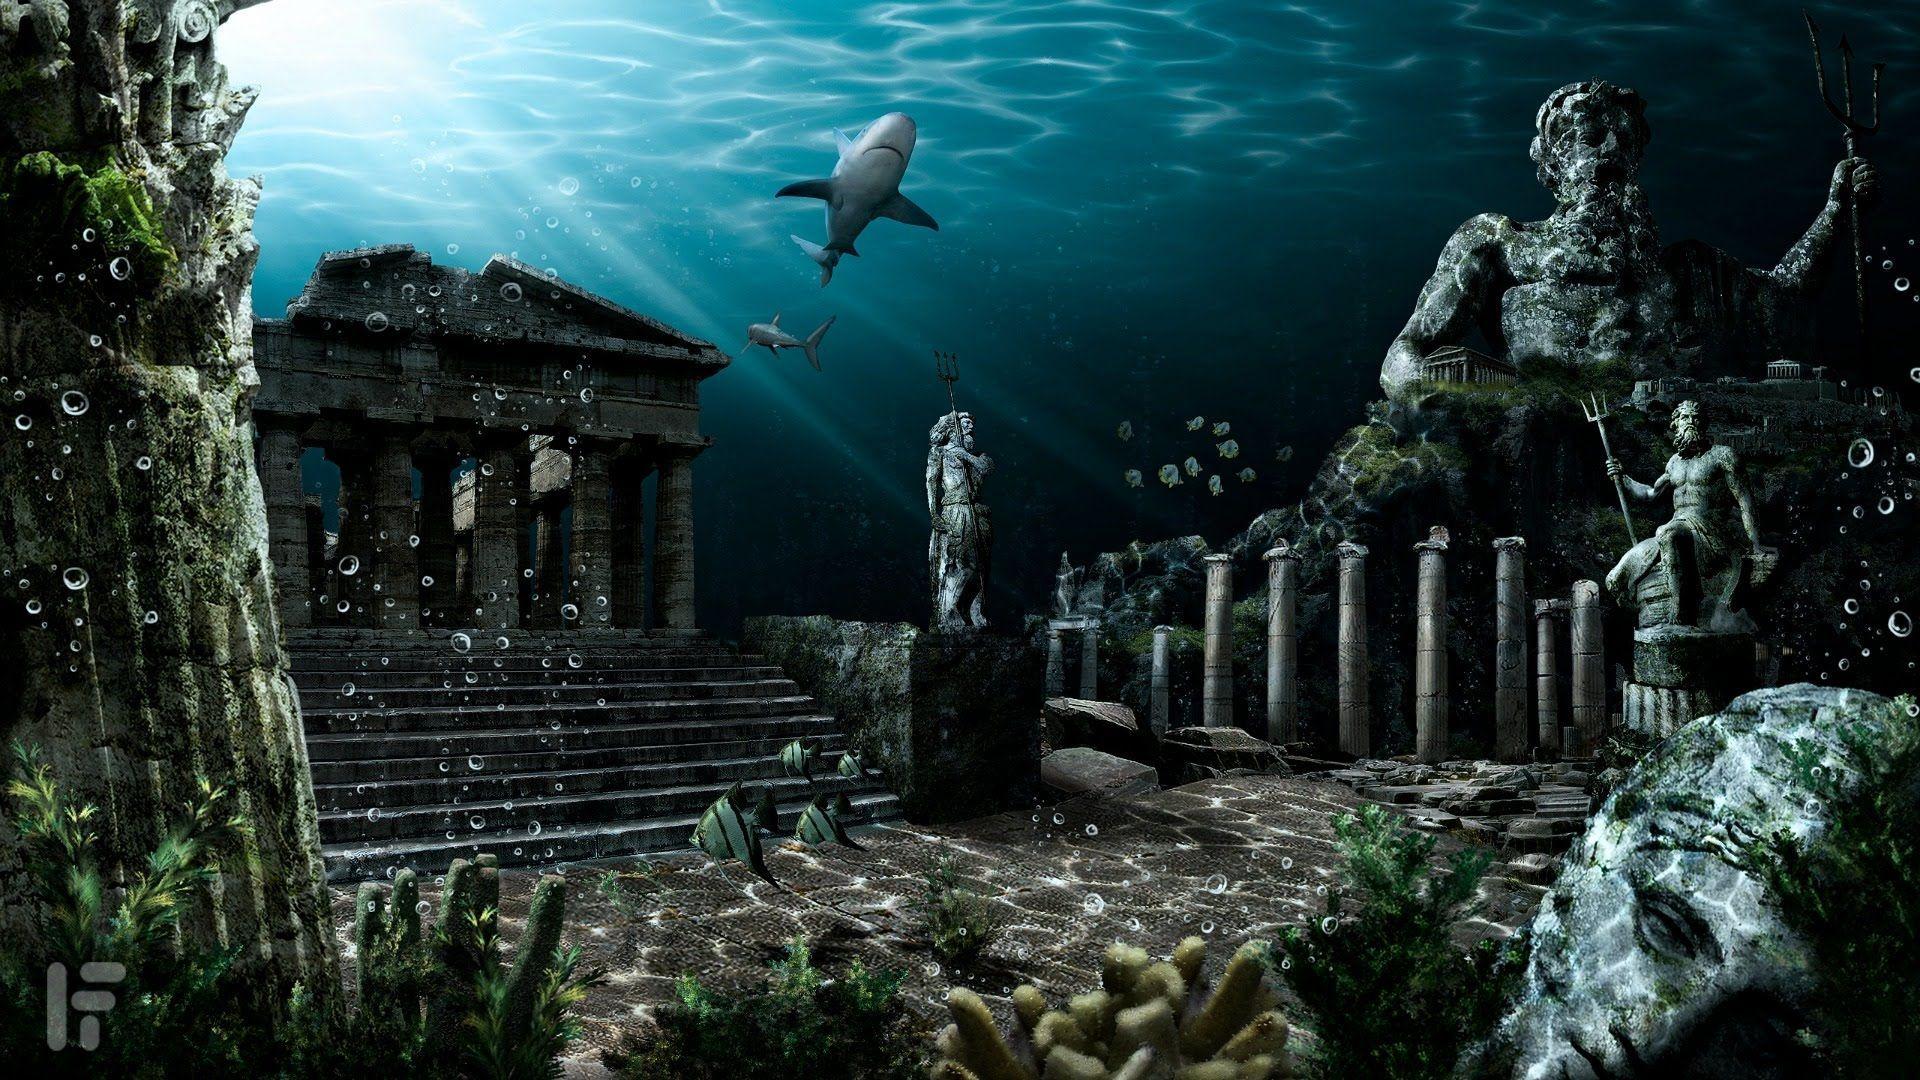 70 Atlantis Underwater Wallpapers Download At Wallpaperbro Lost City Of Atlantis Atlantis The Lost Empire Underwater City